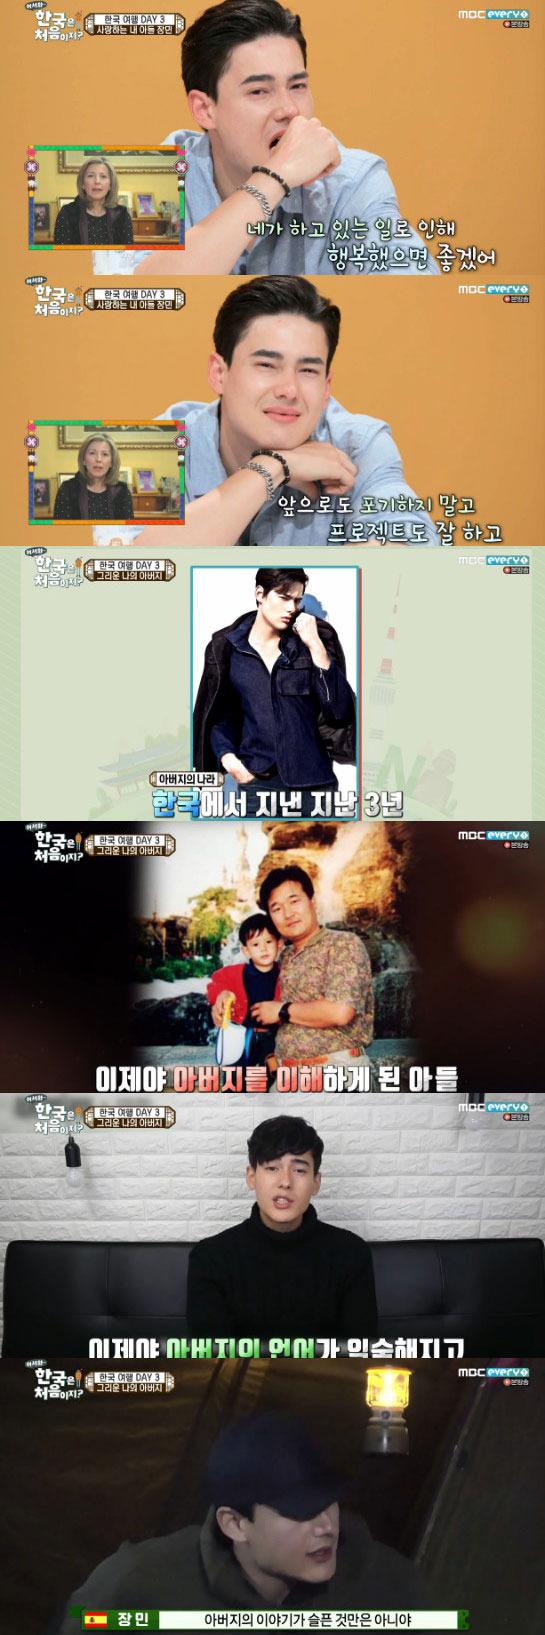 "[RE:TV] '어서와 한국은' 장민, 눈물의 사부곡 ""아버지 잃고 많은 후회"""